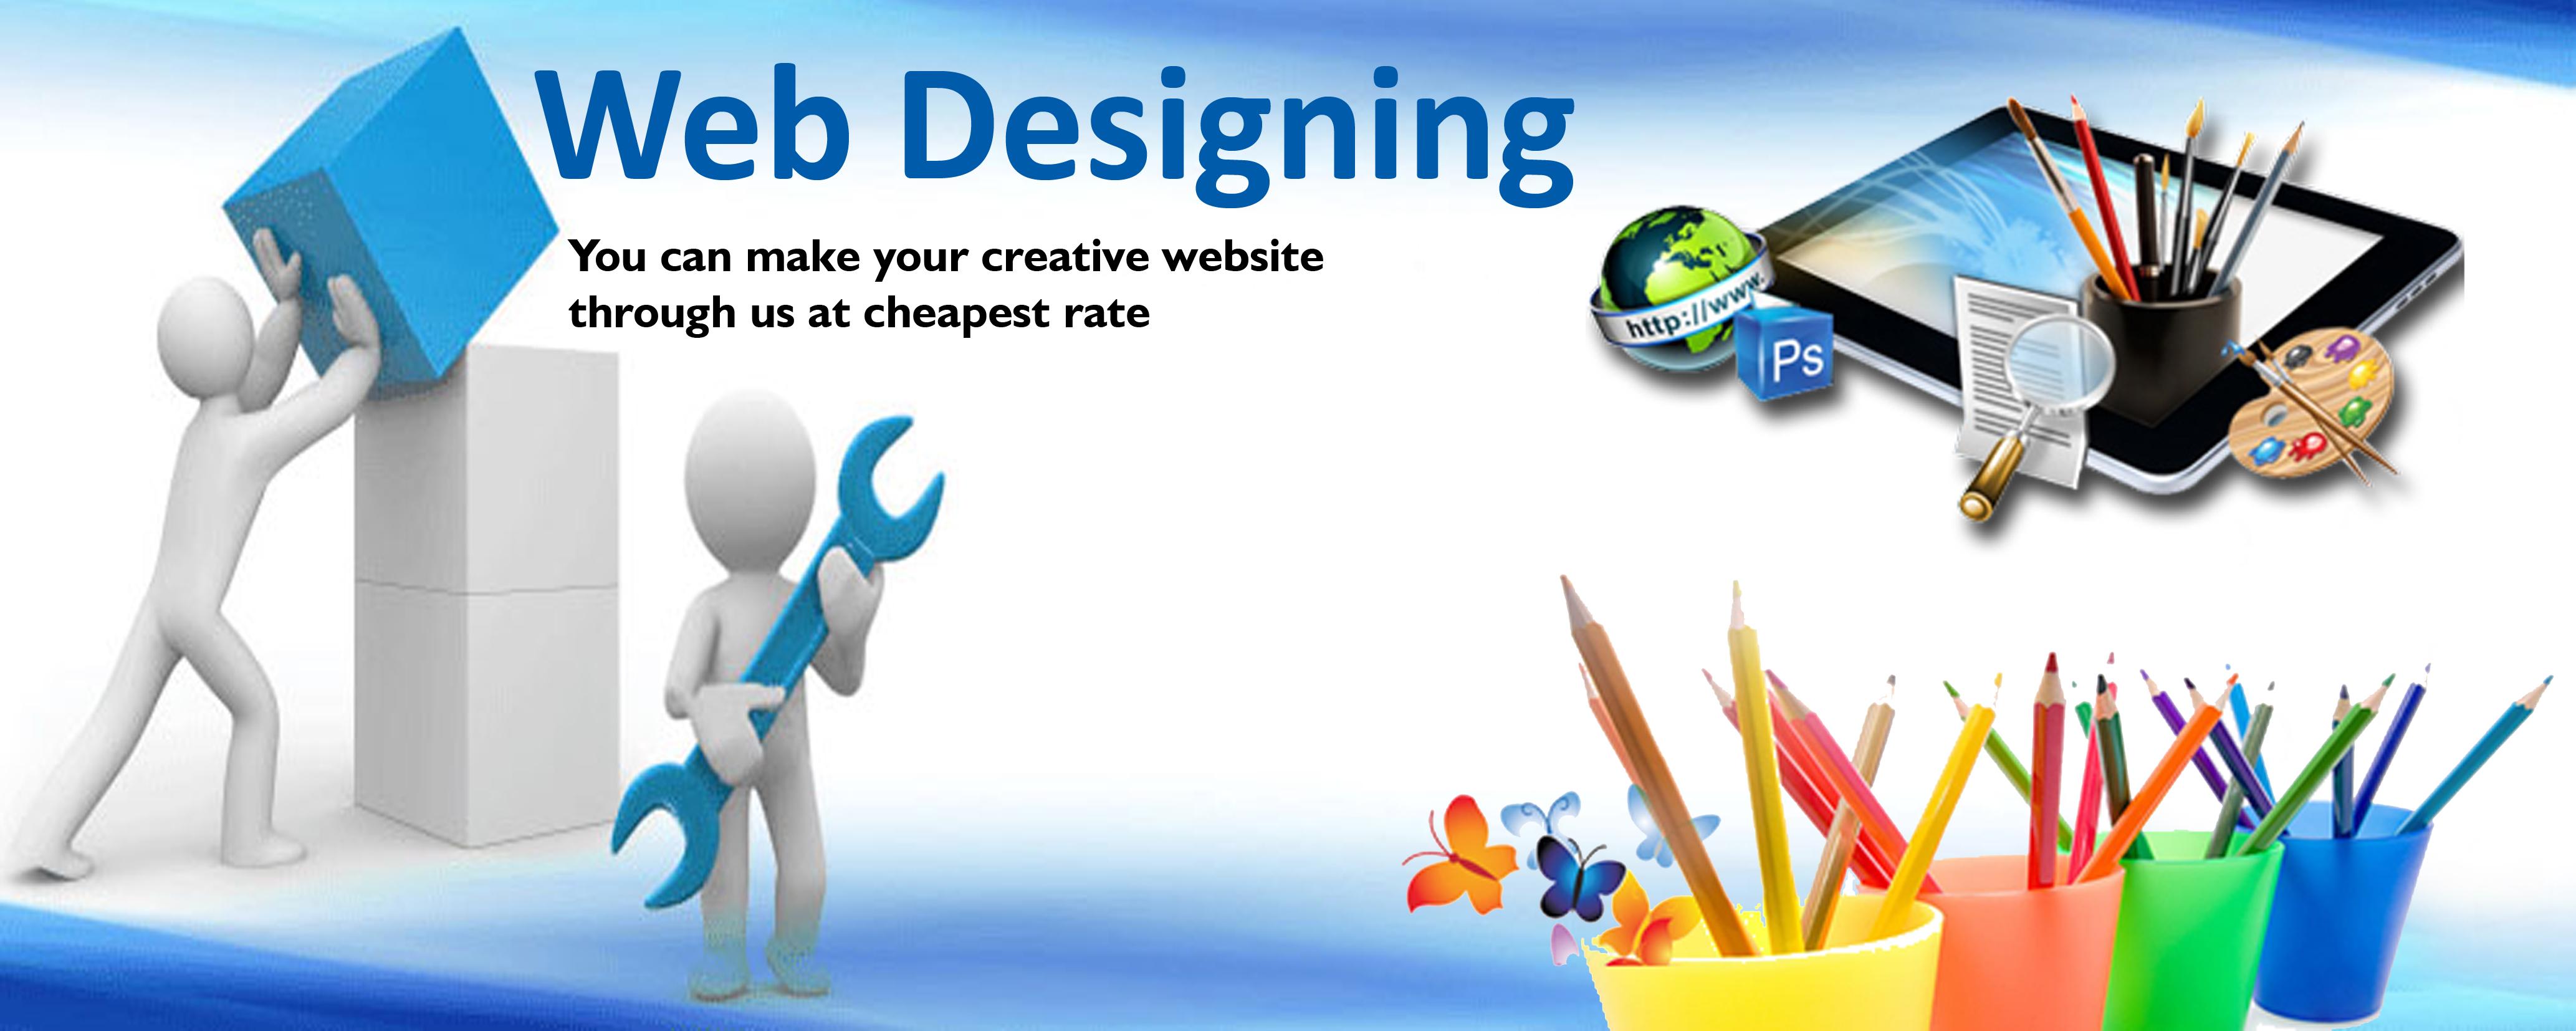 Cheap website design services in noida website website for Best discount designer websites